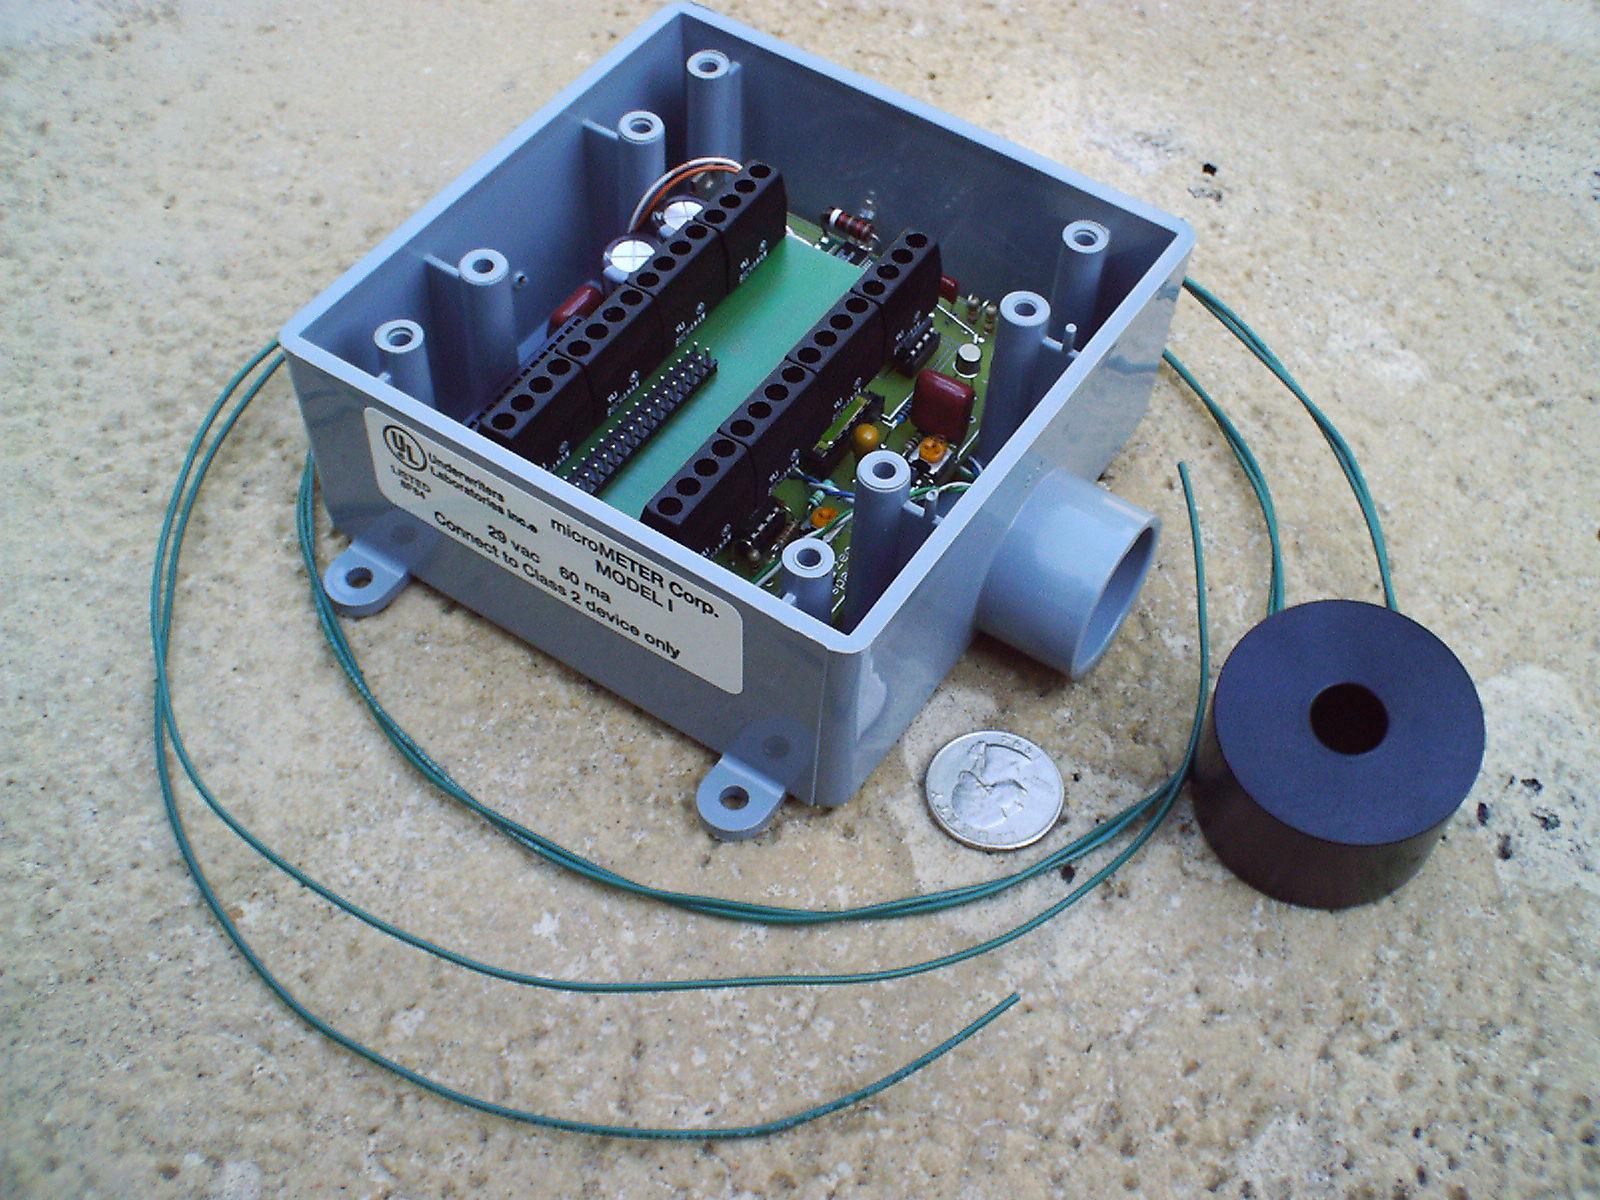 micrometer2001.com